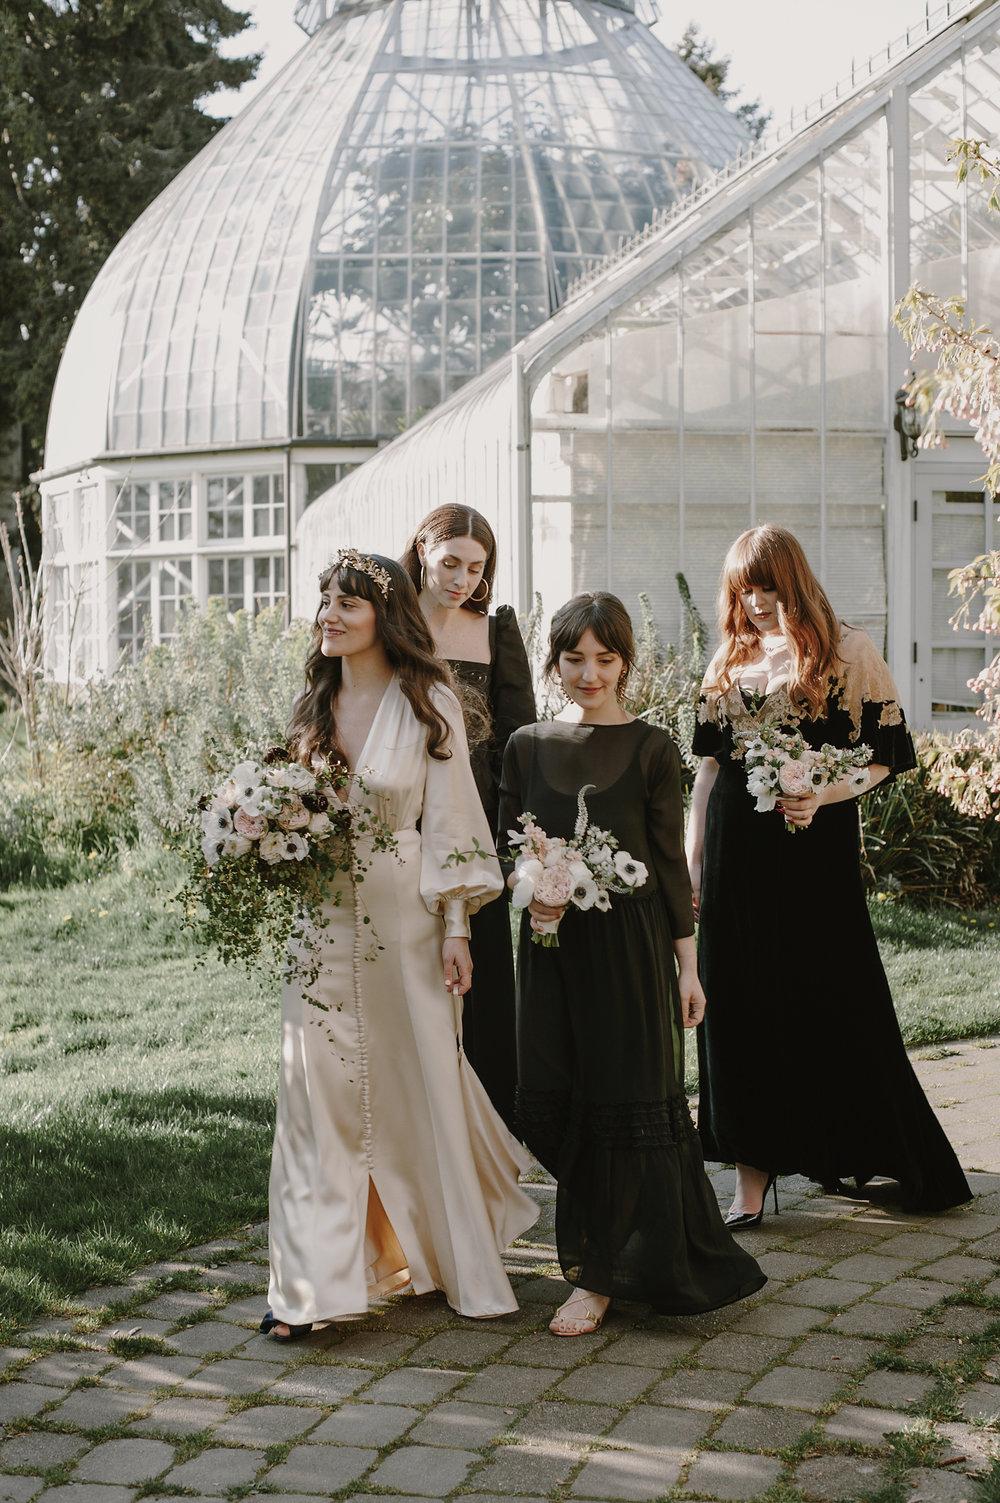 kristenmarieparker_tacoma_conservatory_warehouse_wedding056.JPG